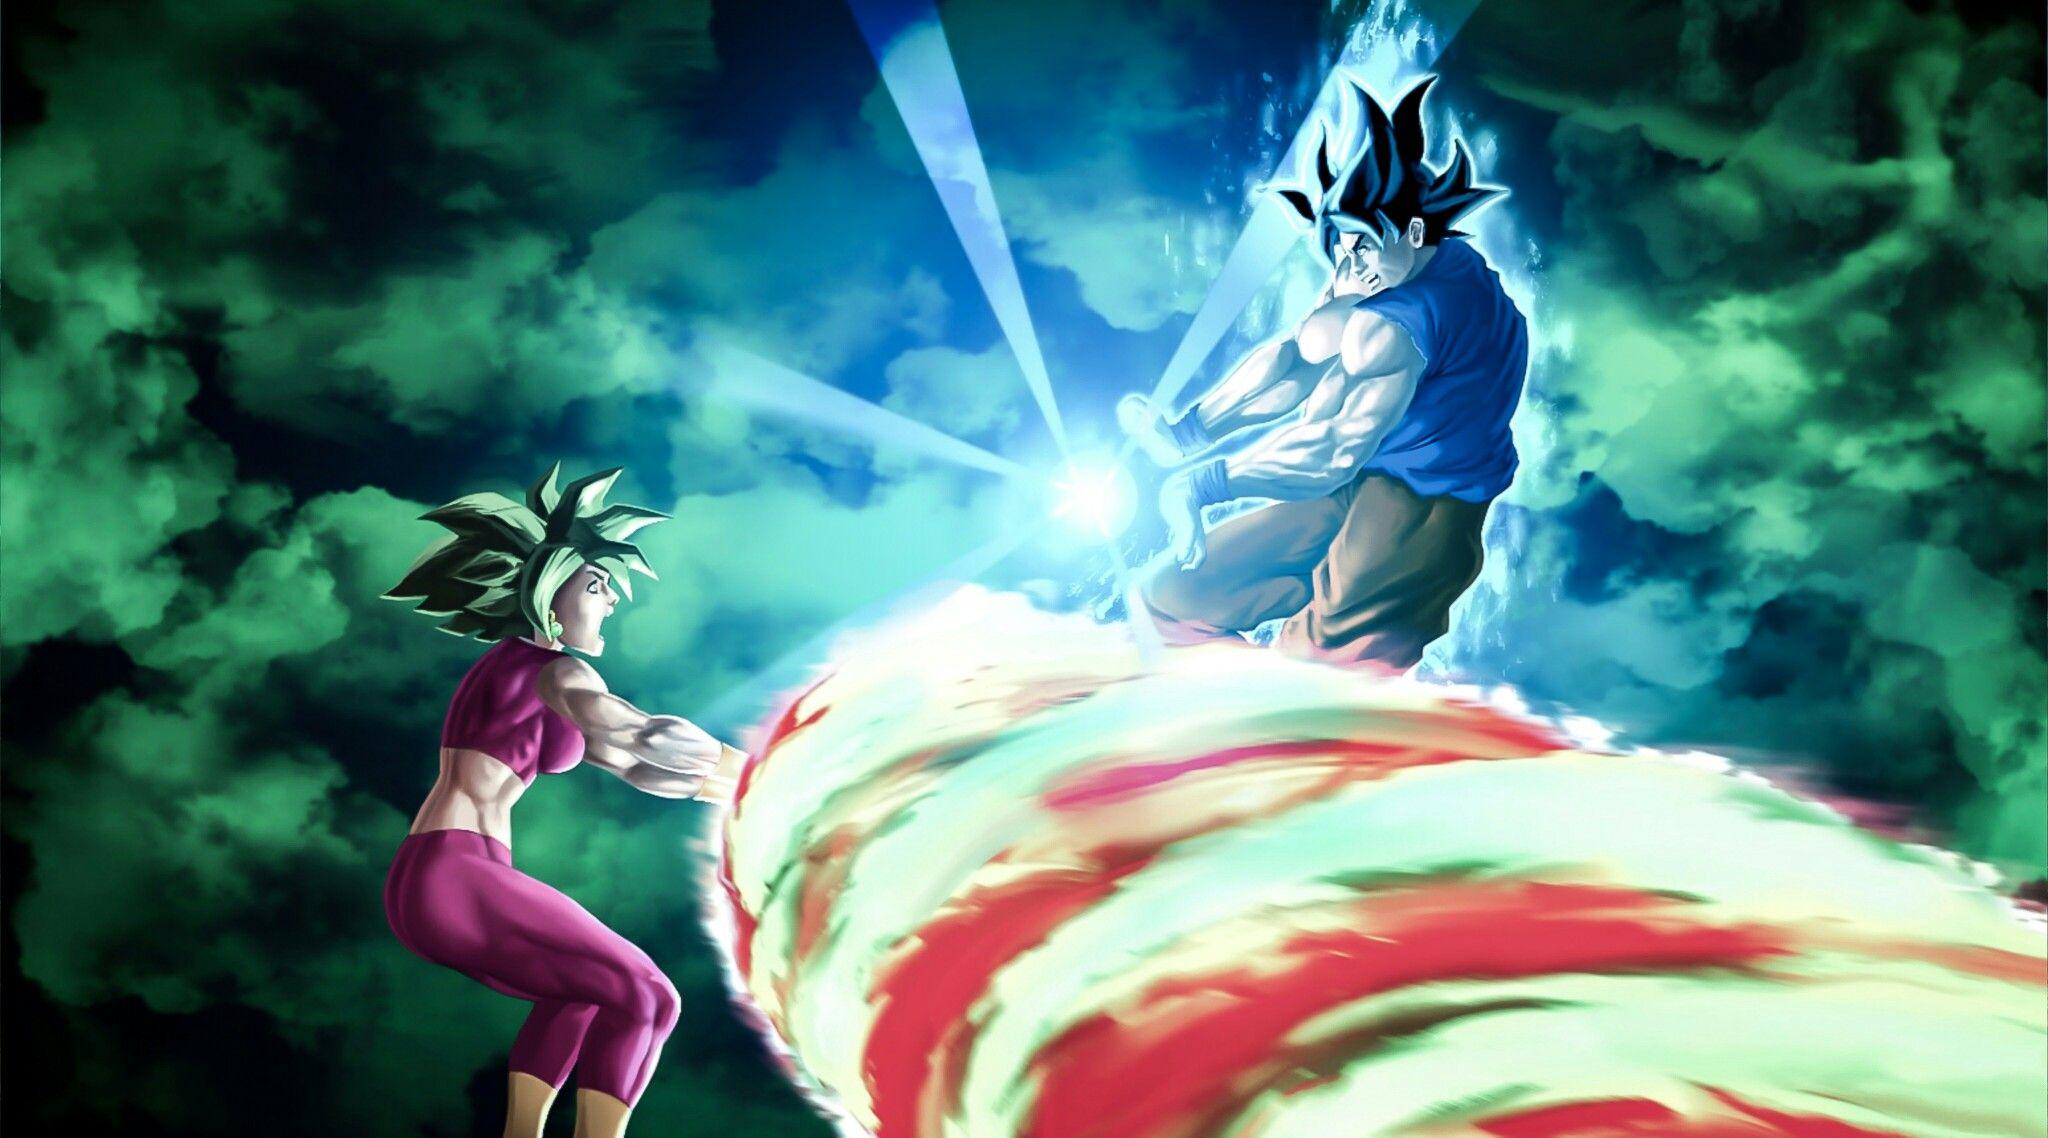 20 Goku Vs Kefla Wallpapers On Wallpapersafari